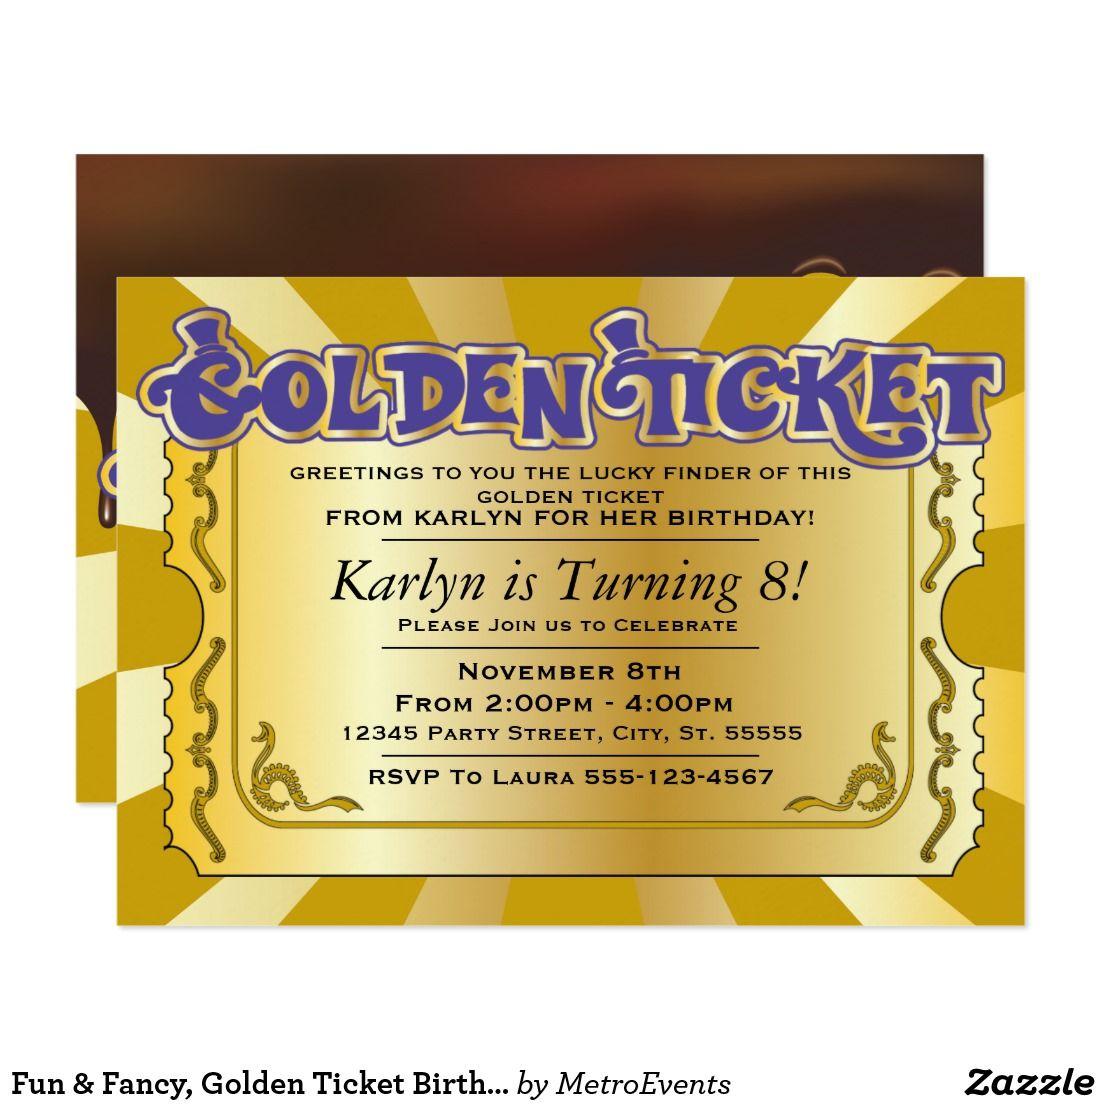 Fun & Fancy, Golden Ticket Birthday Invitations Fun & Fancy, Golden ...